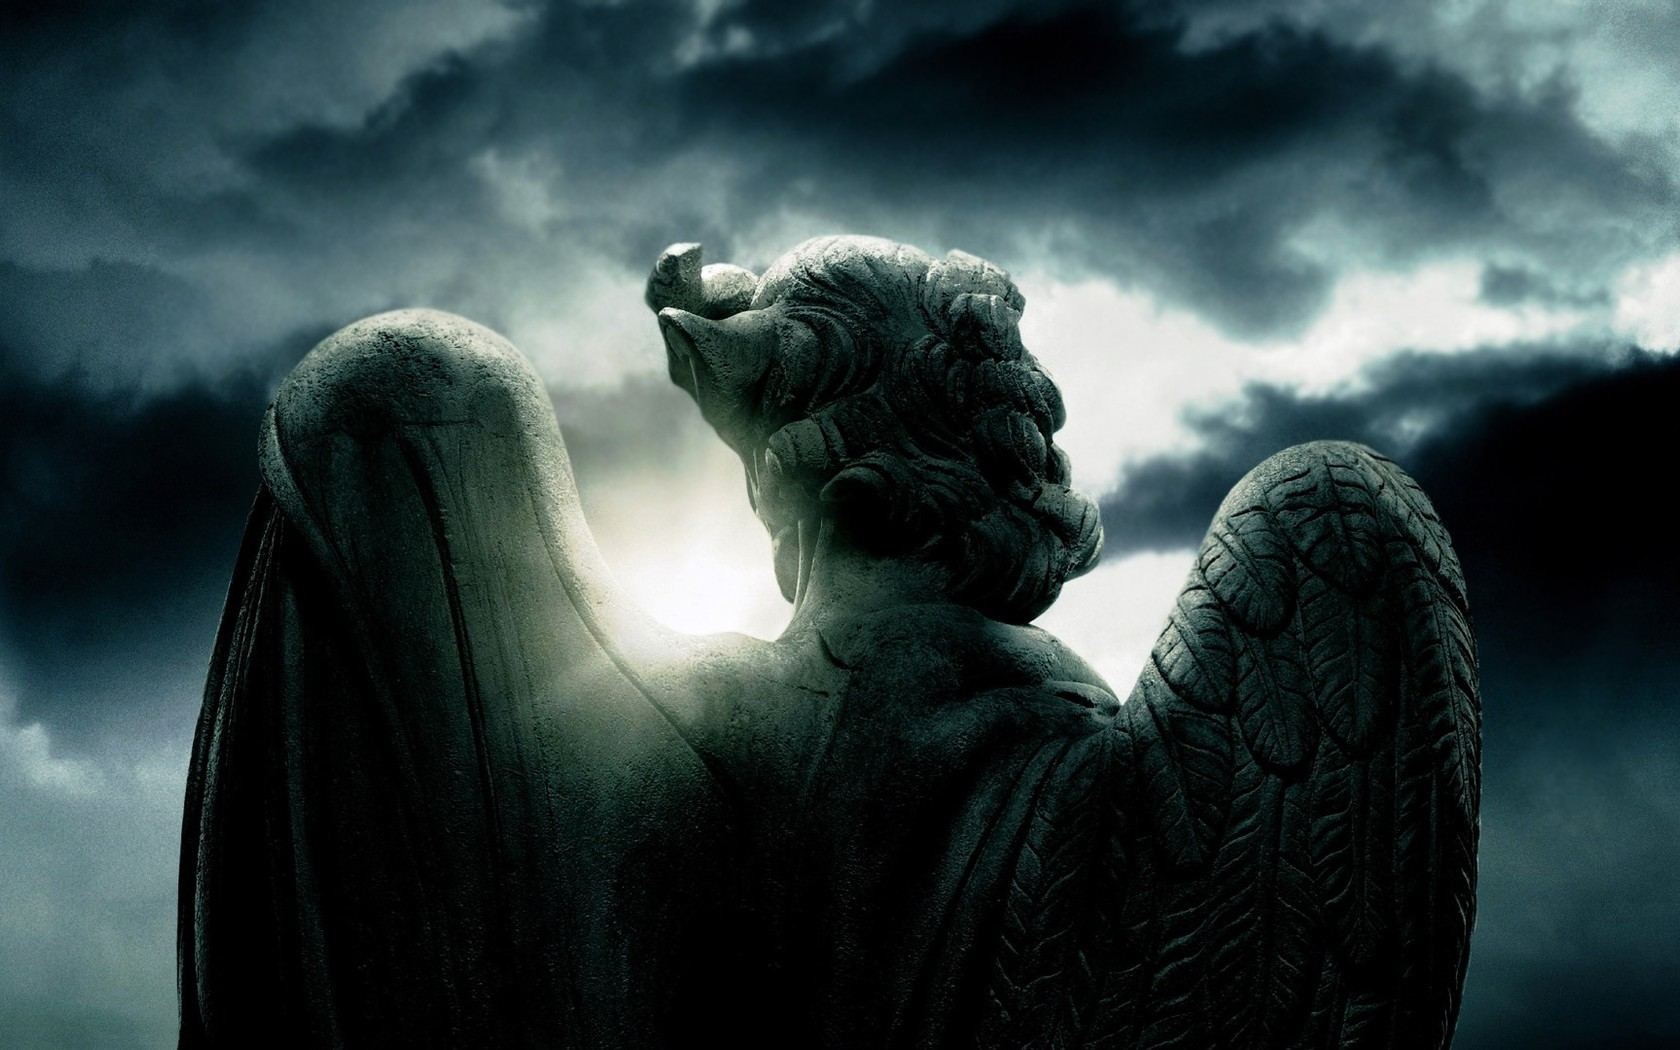 Download Angel statue wallpaper 1680x1050